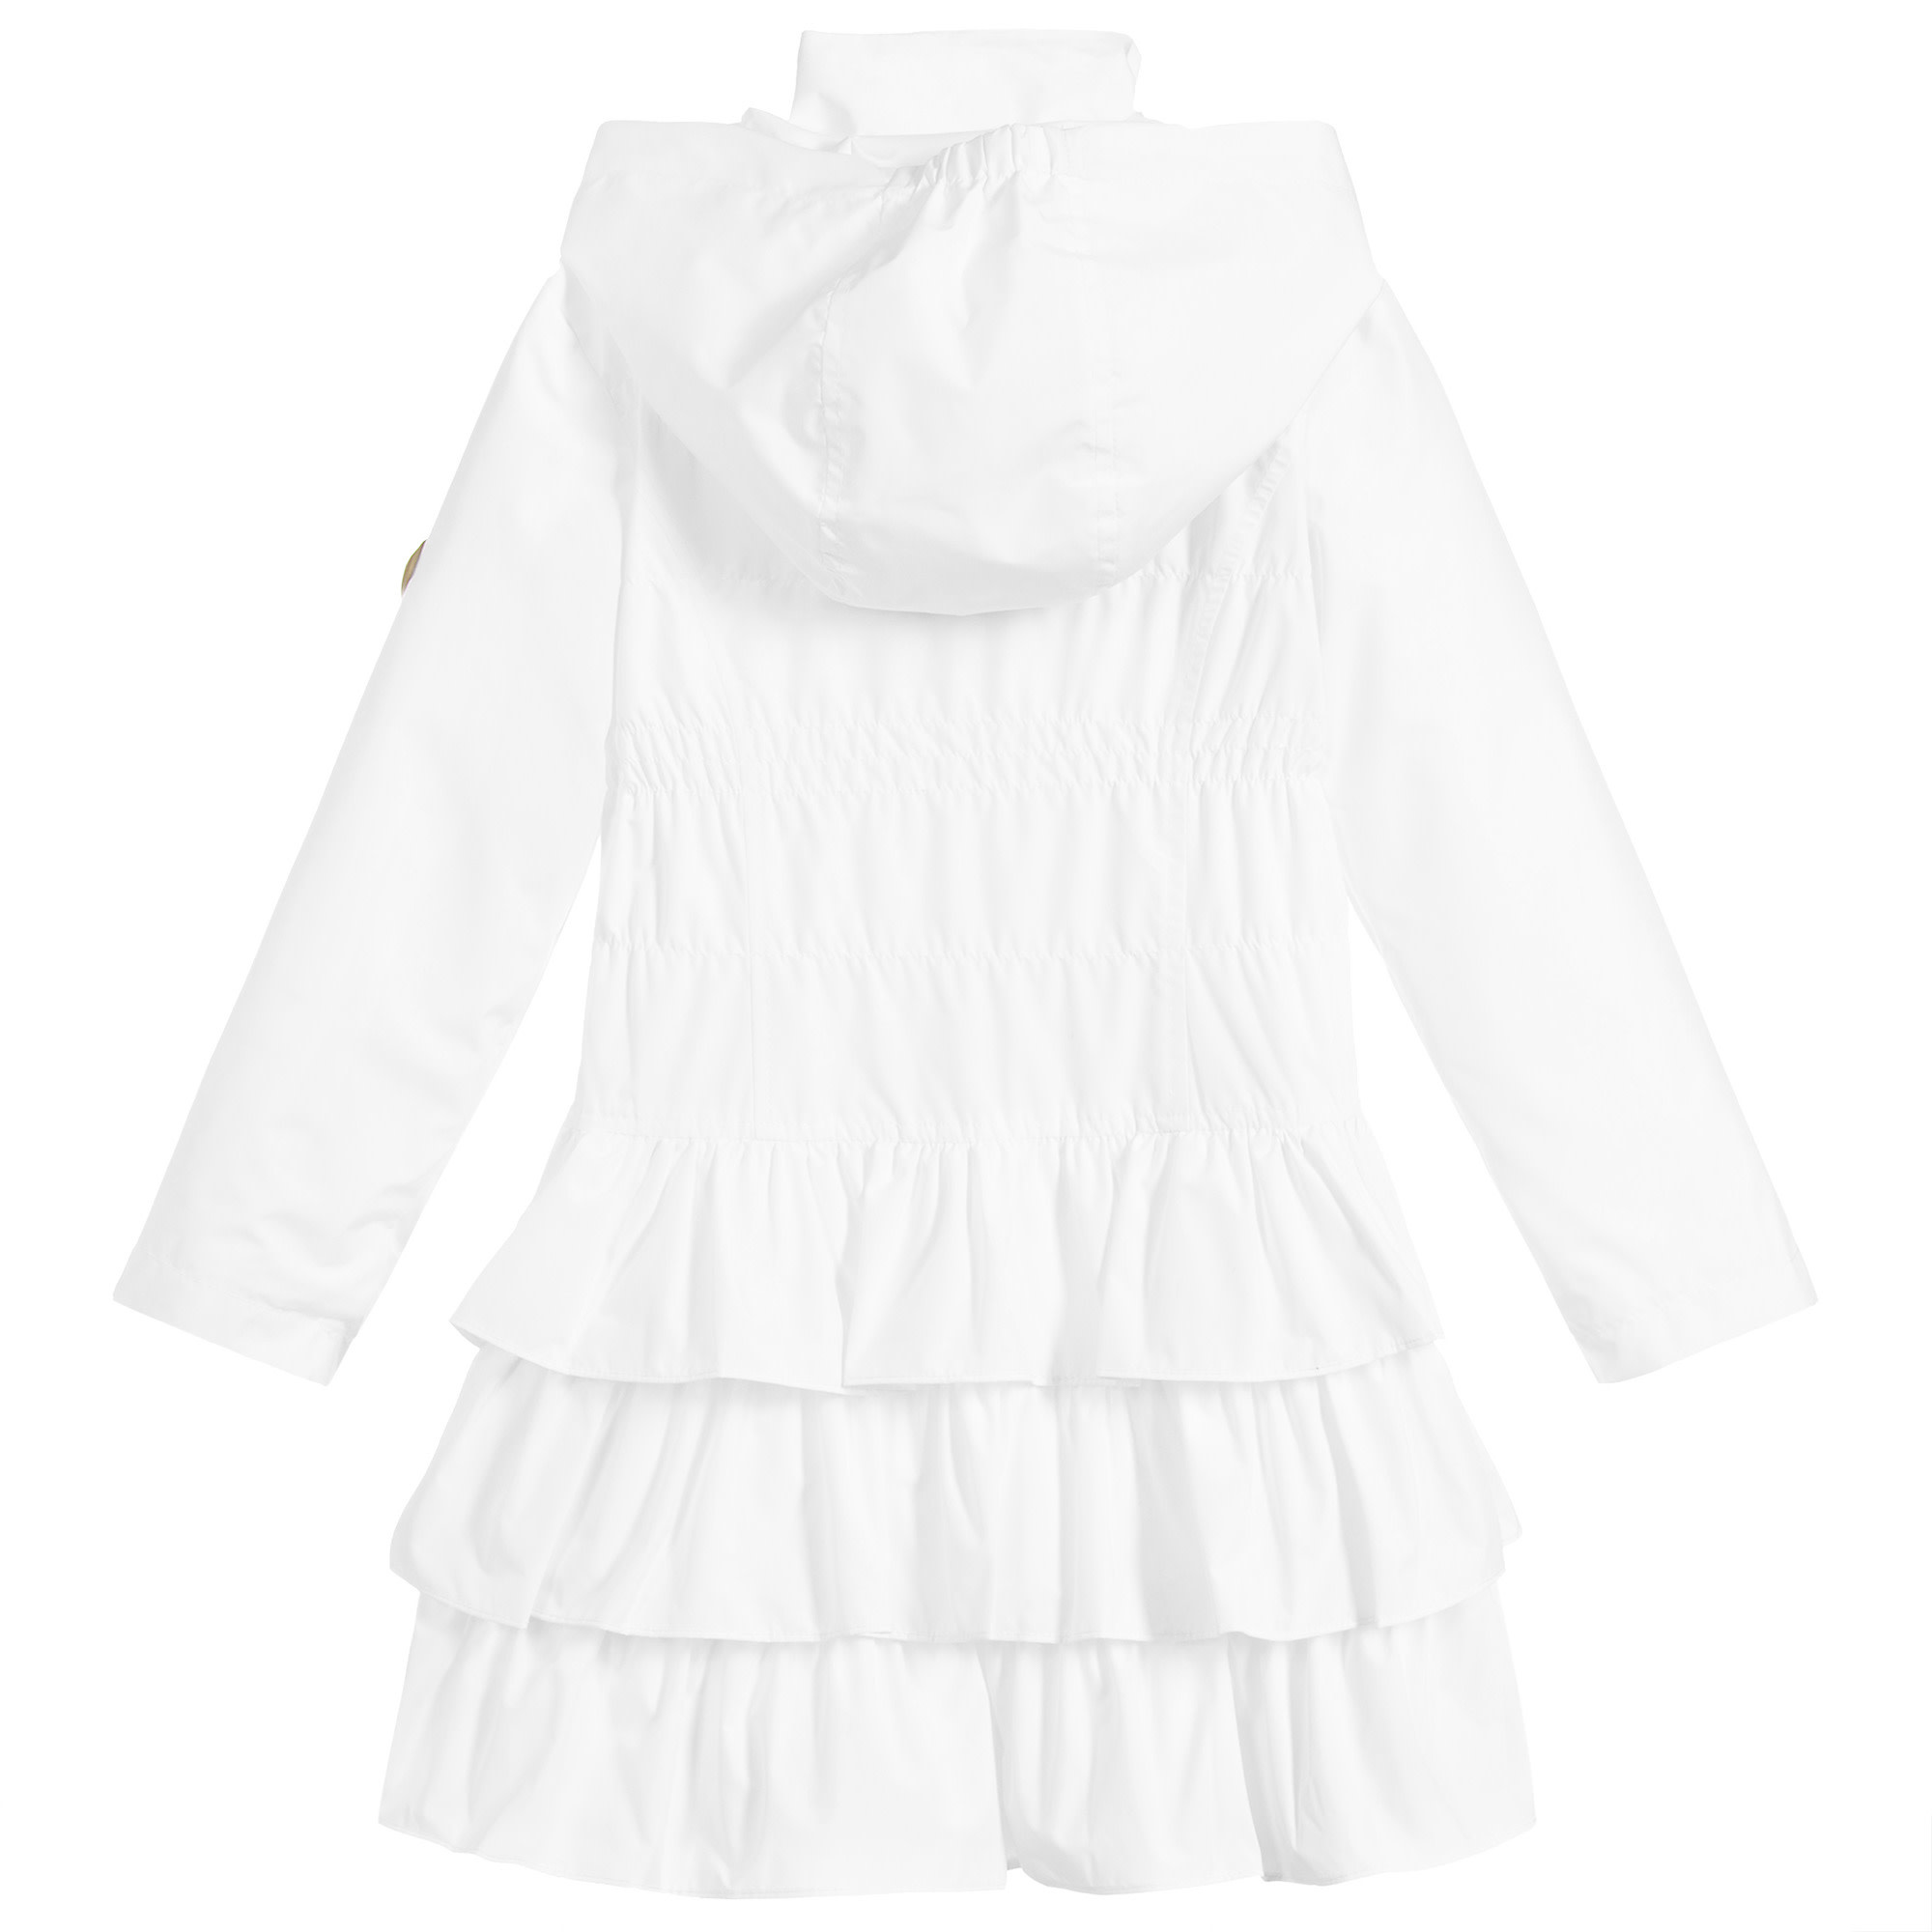 Lechic LeChic White Ruffle Plain Coat 5211